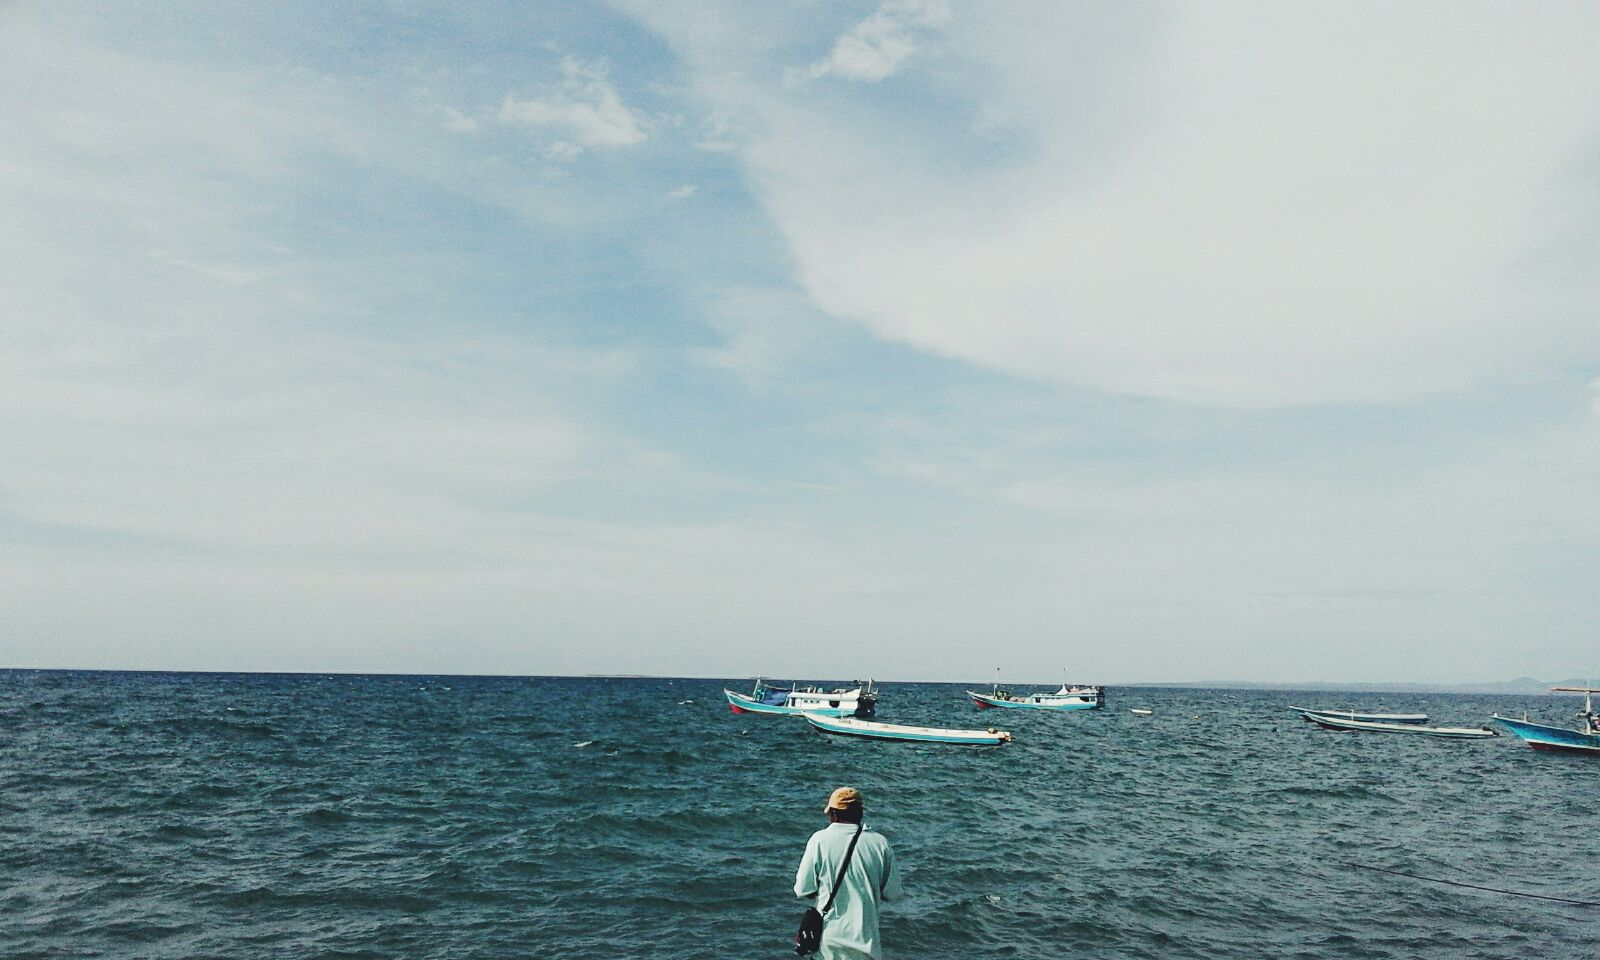 Blue Beach Holiday Image By Geri Kua